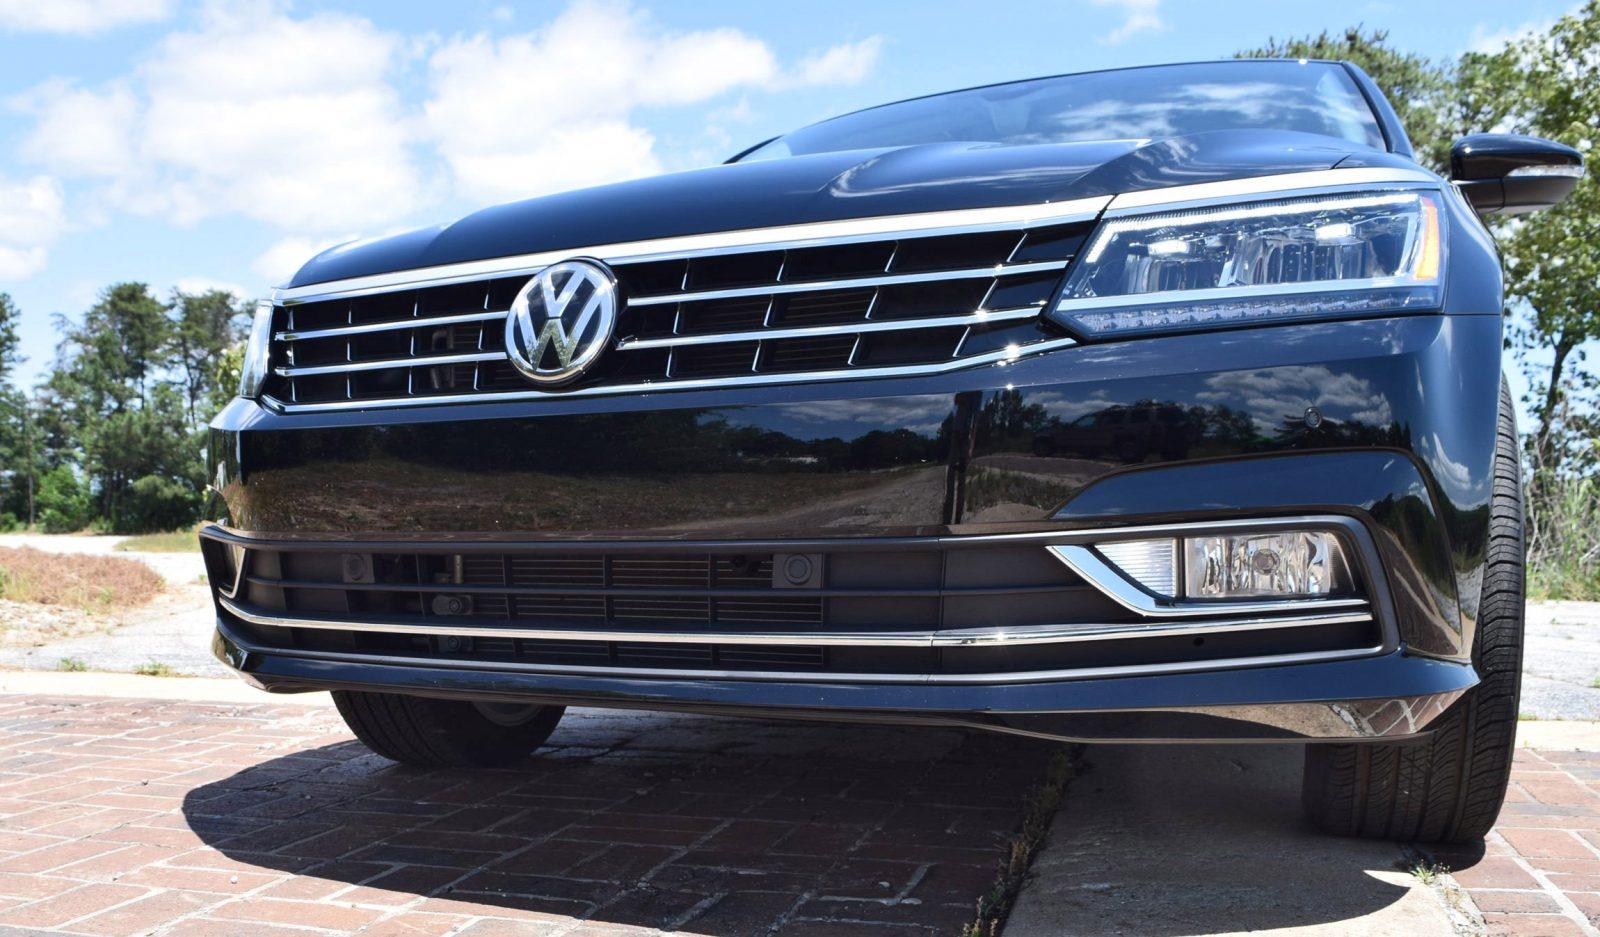 2016 Volkswagen Passat 1 8t Sel Premium Hd First Drive